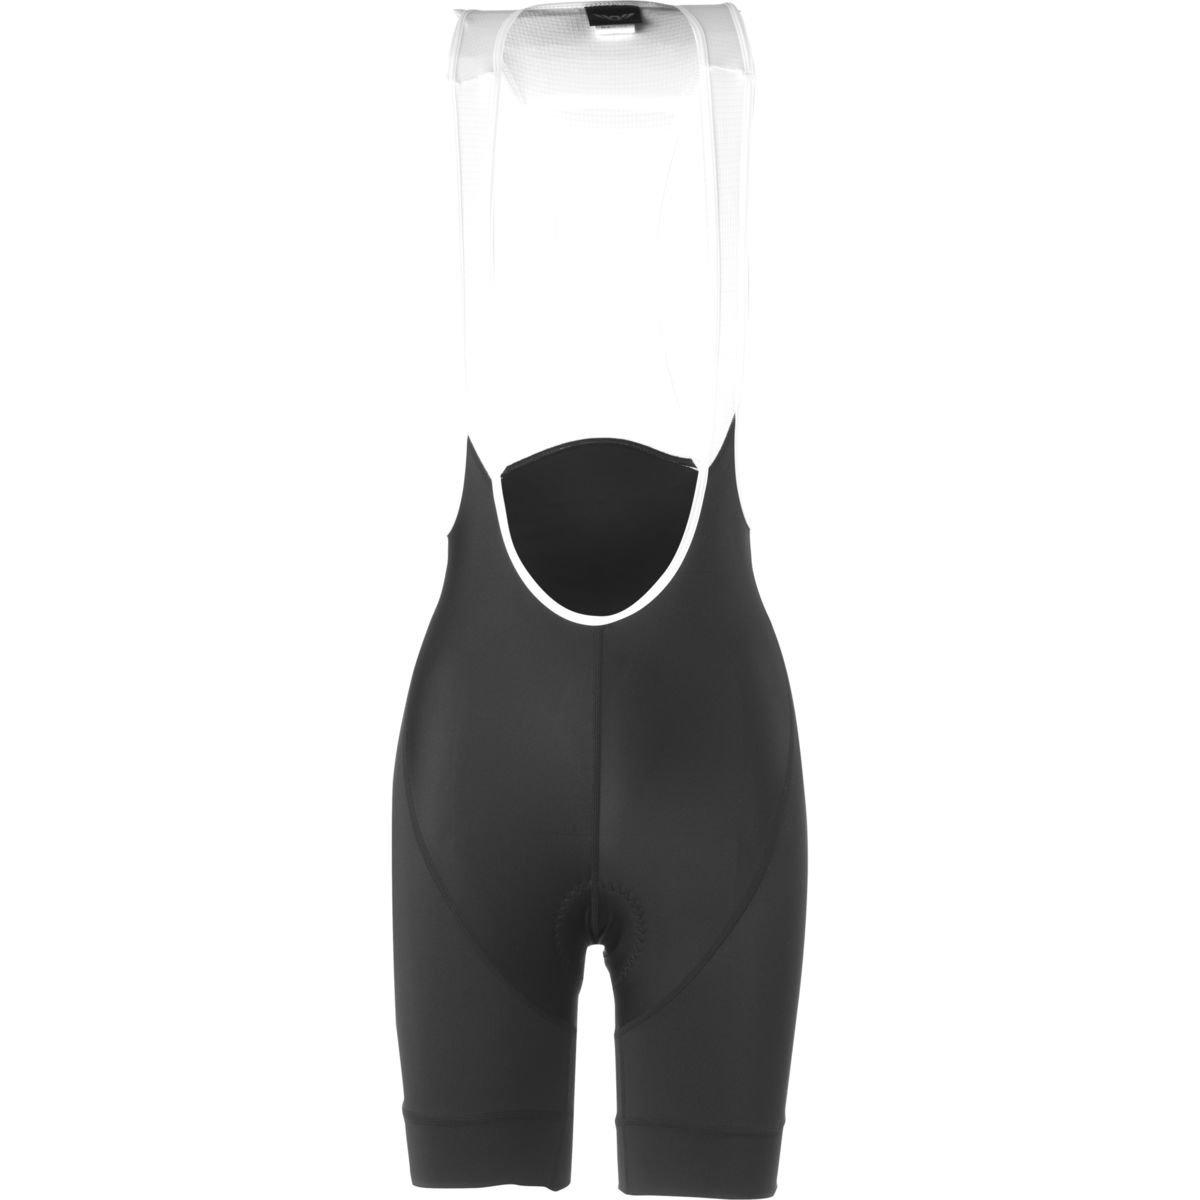 Twin Six Standard Bib Shorts – Women 'sブラック, XS   B018UABE7E